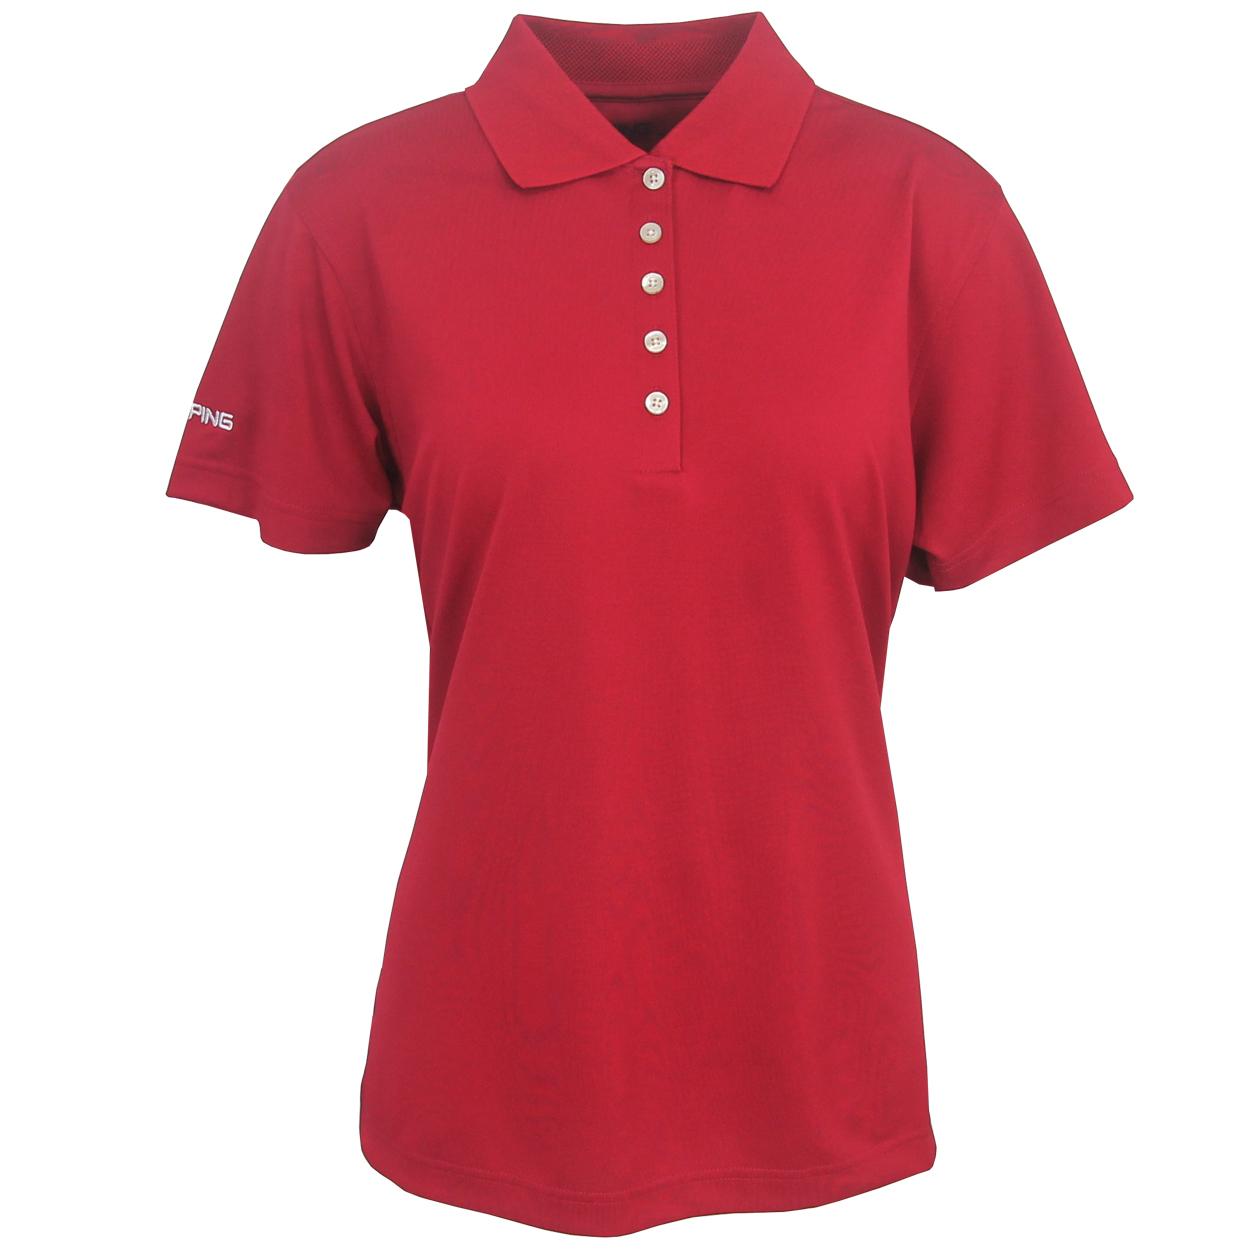 Ping women 39 s albatross performance polo golf shirt brand new for Polo brand polo shirts